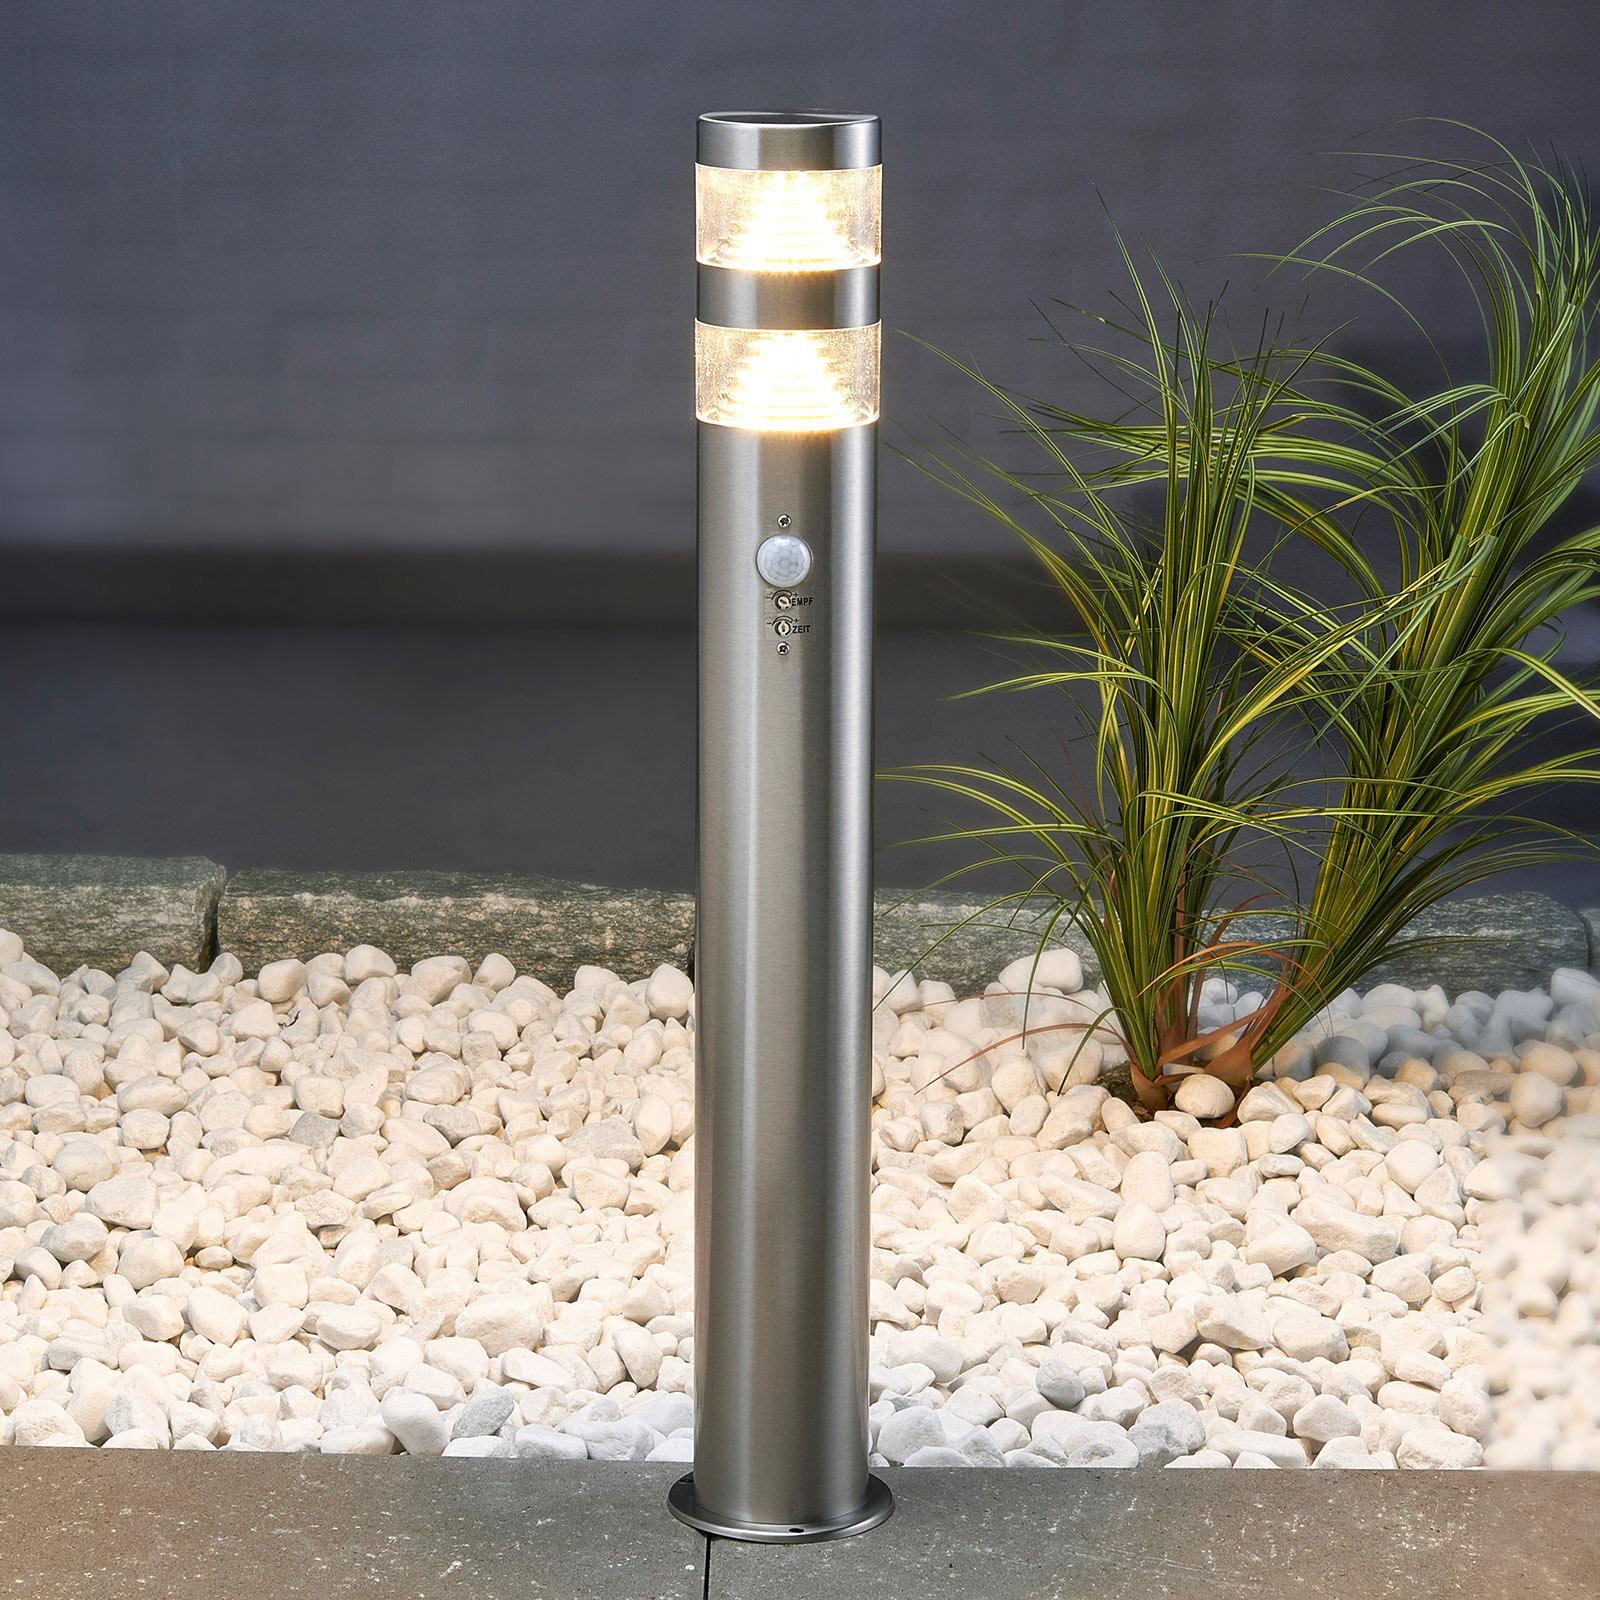 LED-pihatievalaisin Lanea tunnistimella, 60 cm